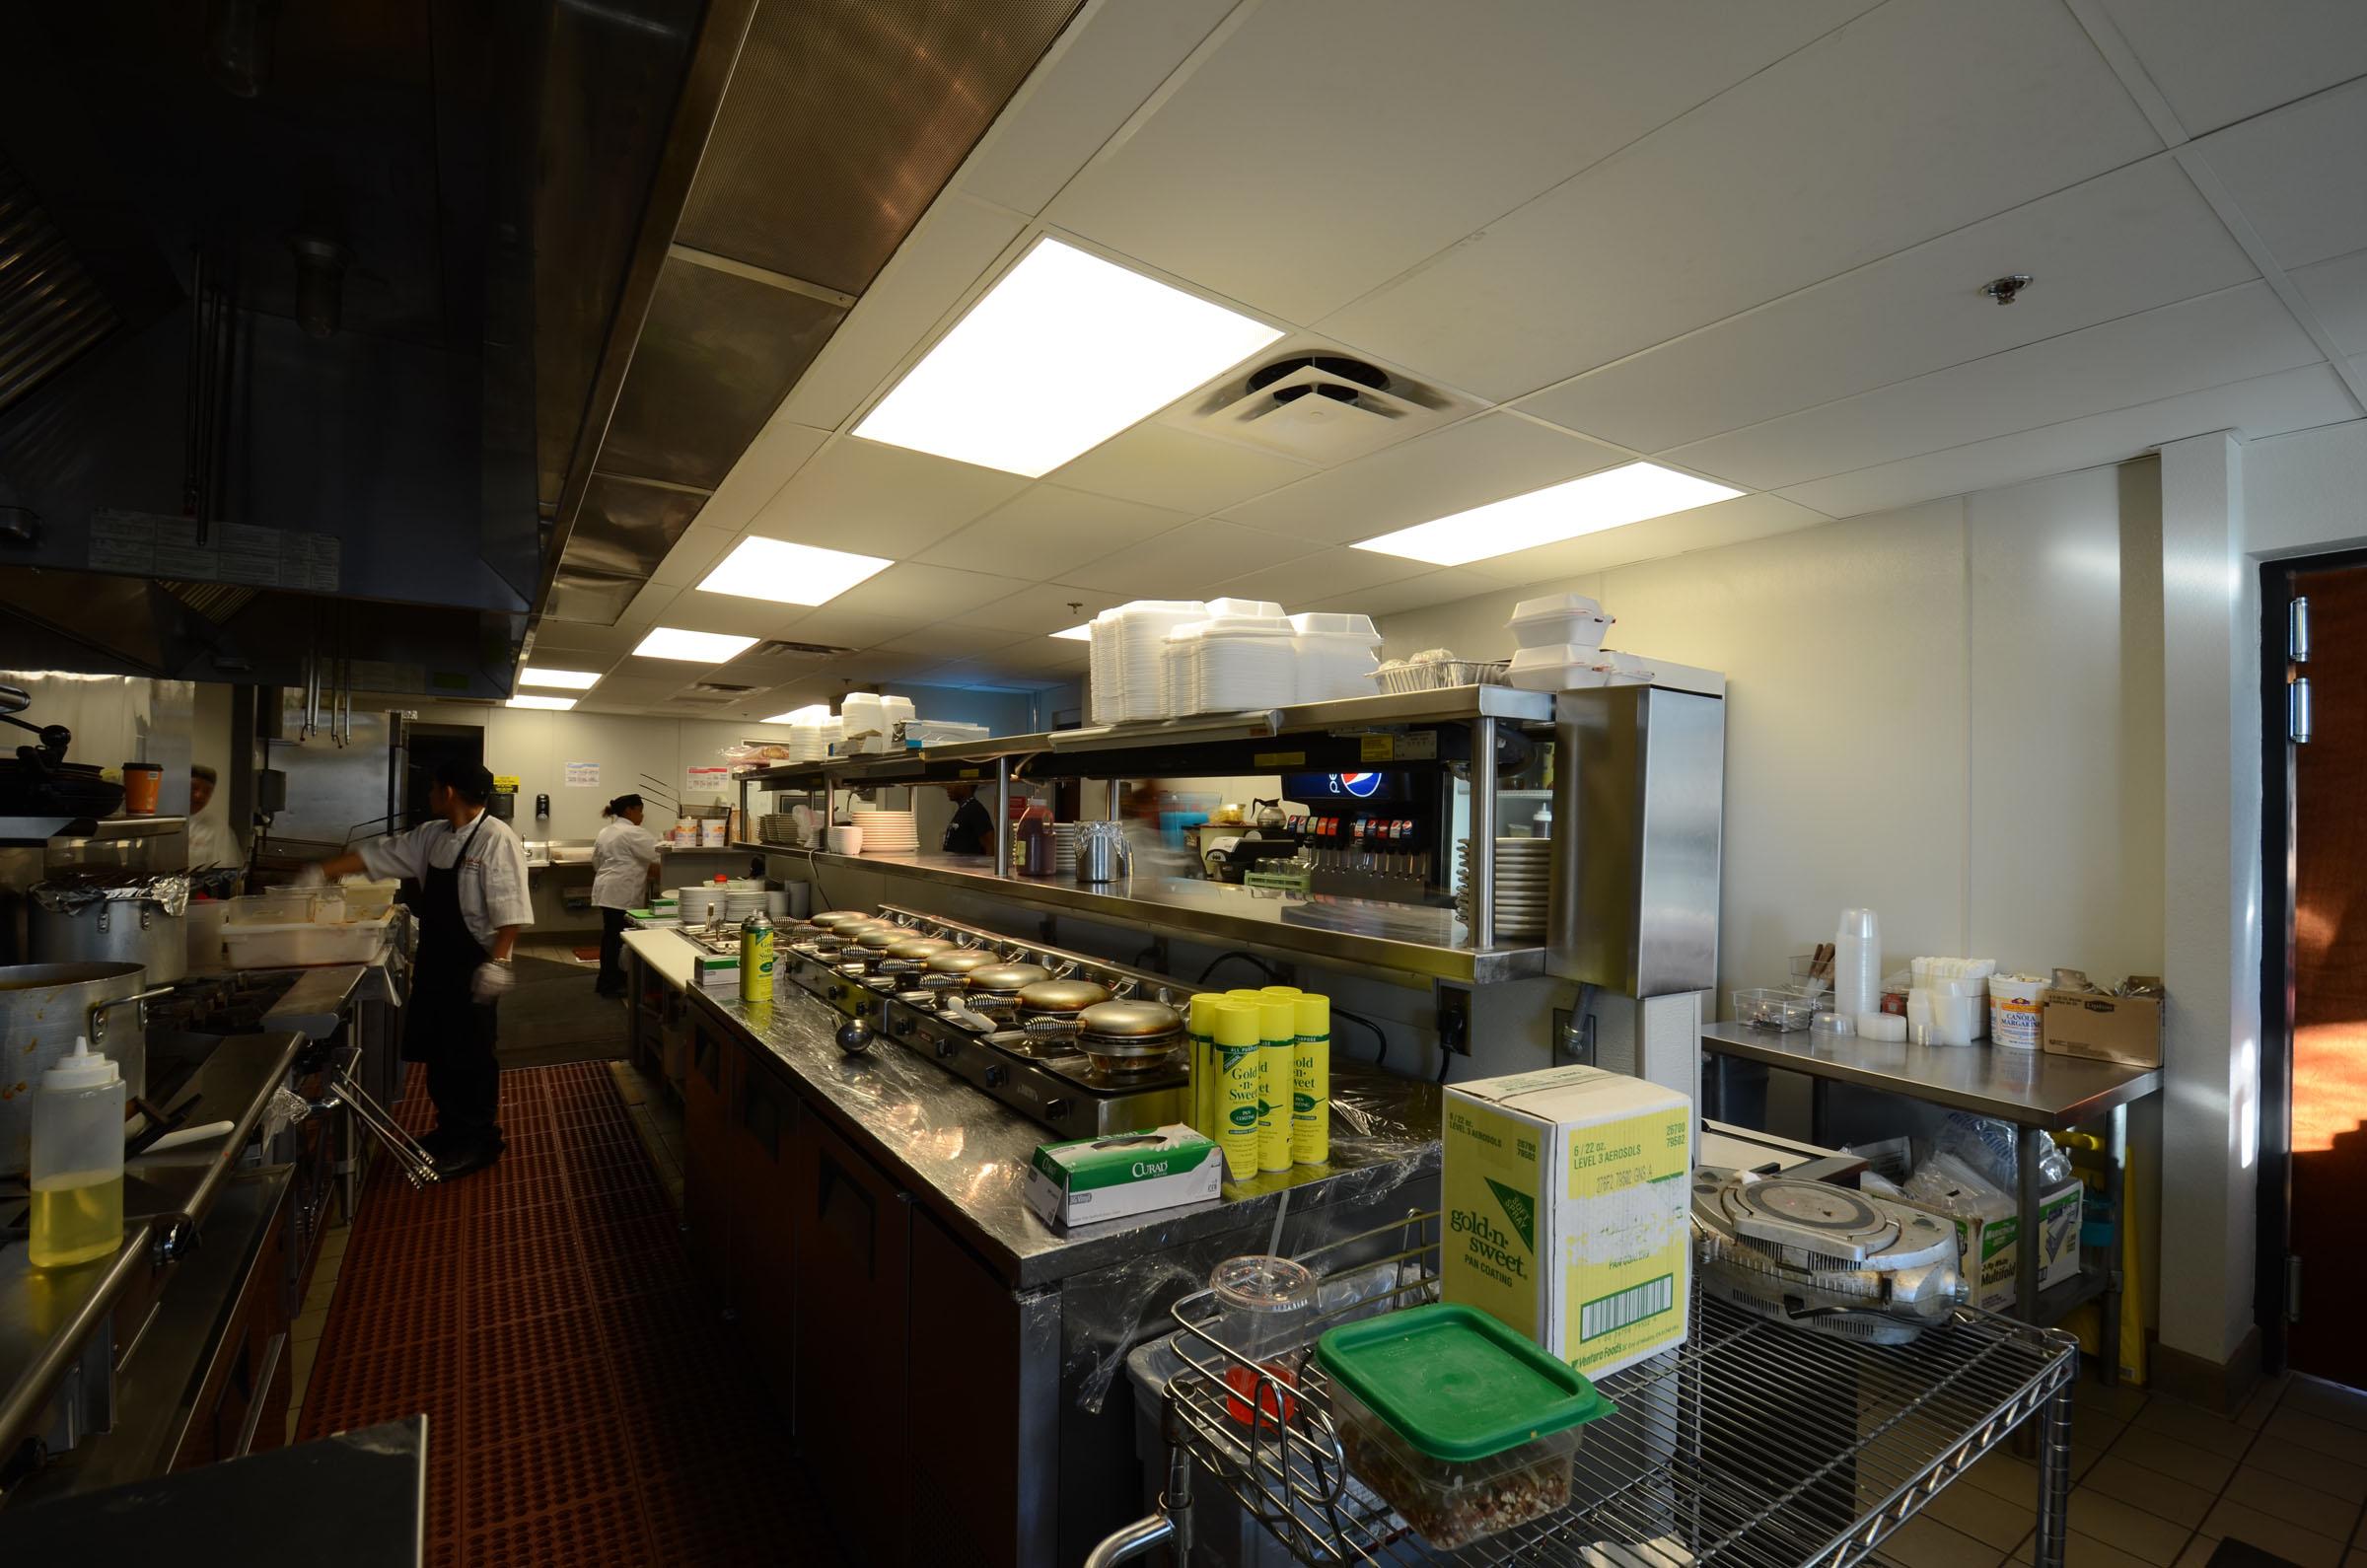 Restaurant Serving Line